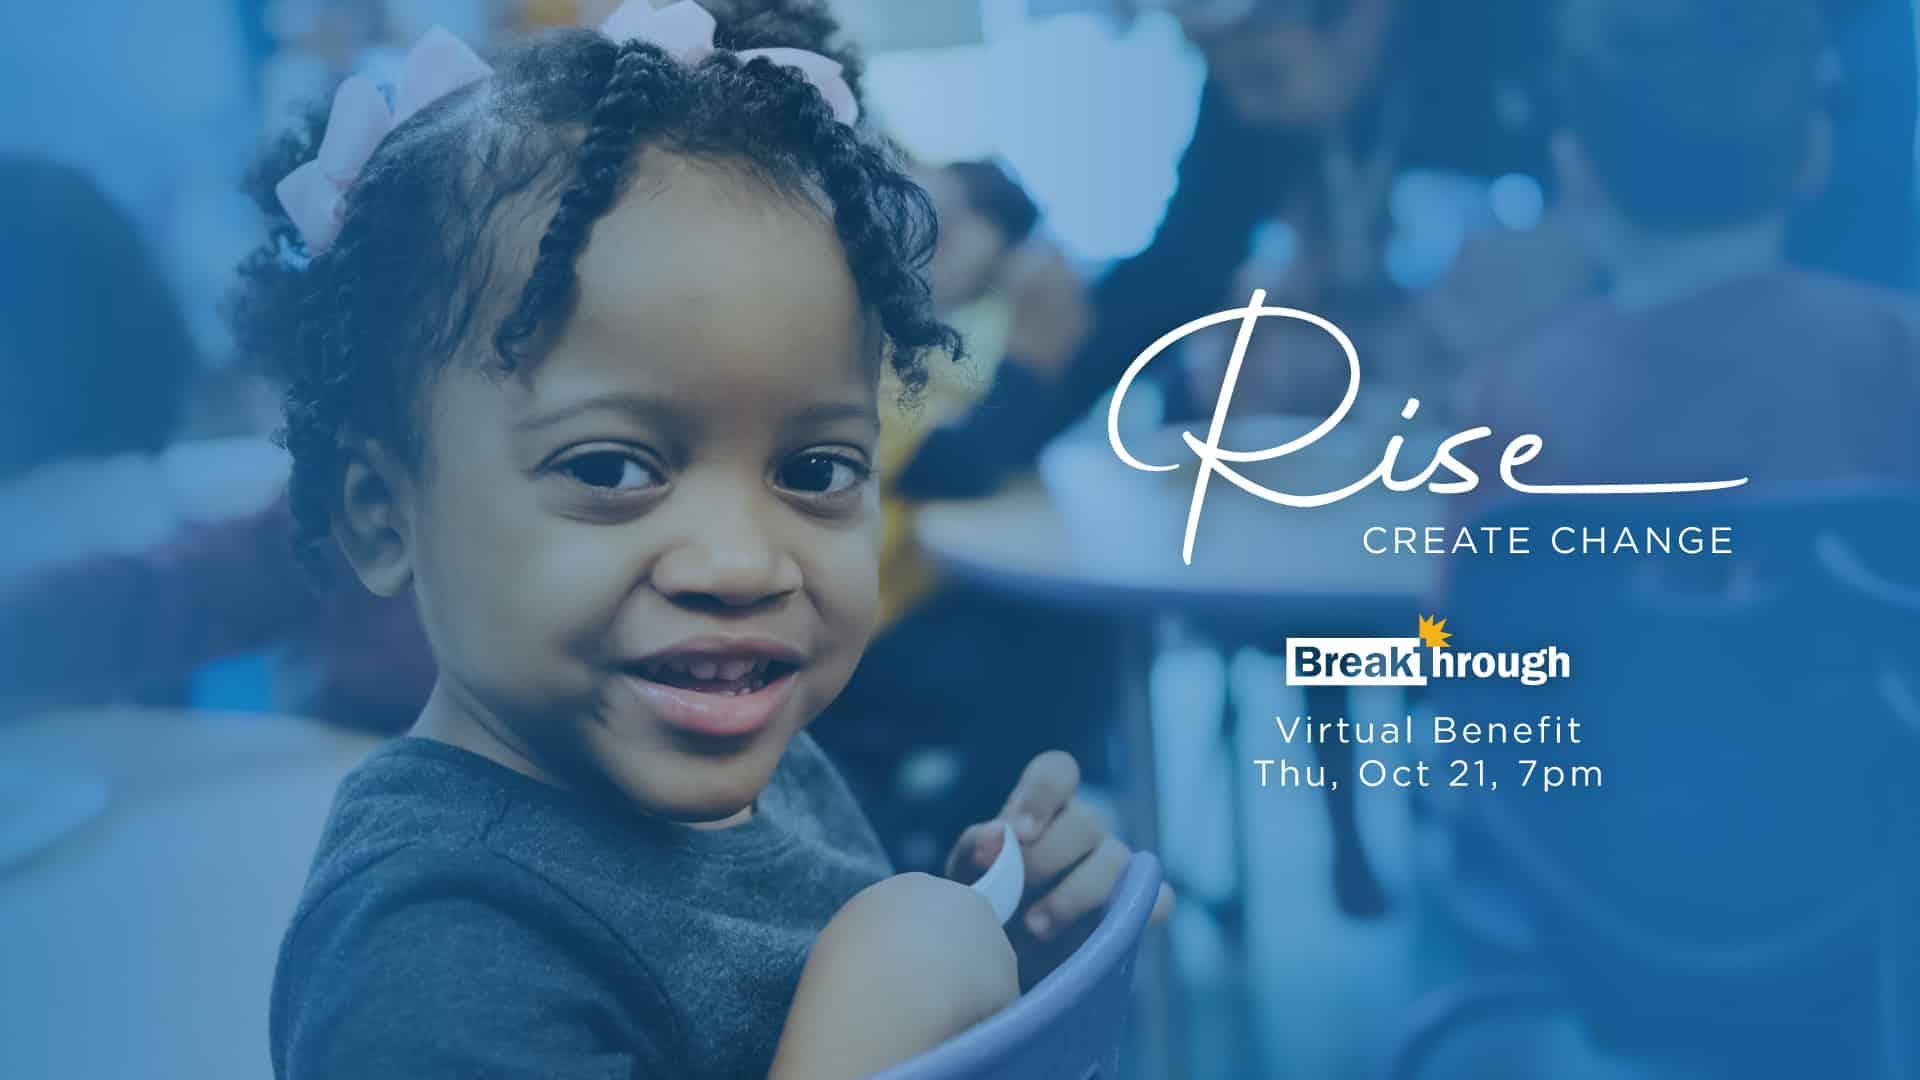 Rise Create Change Breakthrough annual benefit virtual Chicago